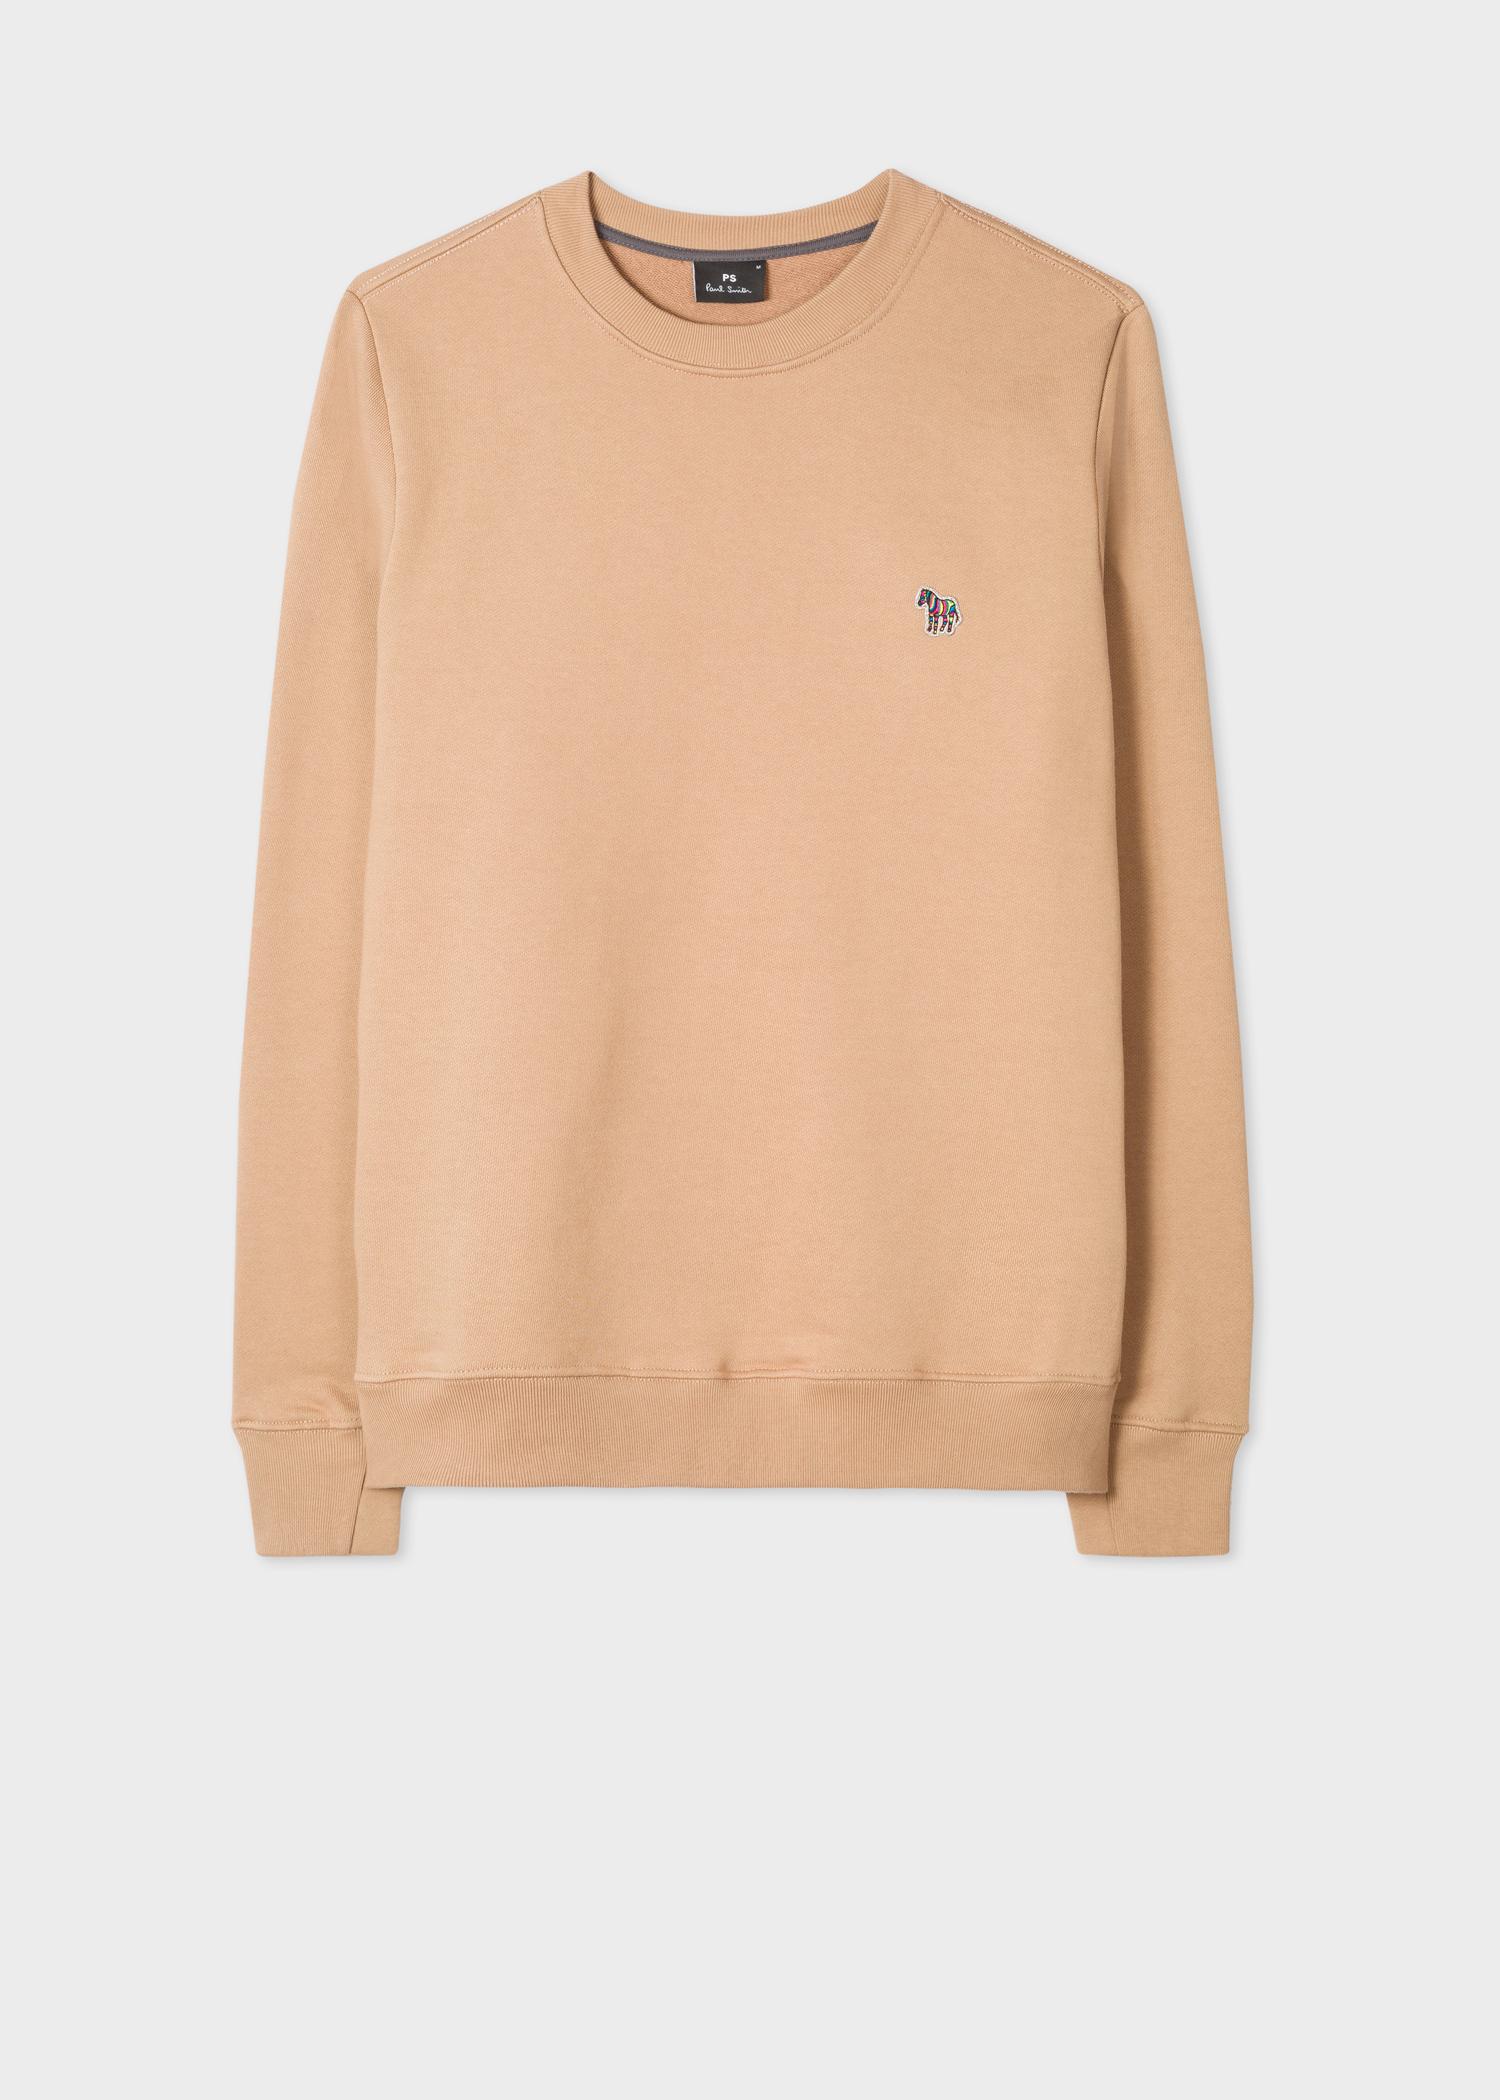 21643914a Front view - Men's Camel Organic-Cotton Zebra Logo Sweatshirt Paul Smith